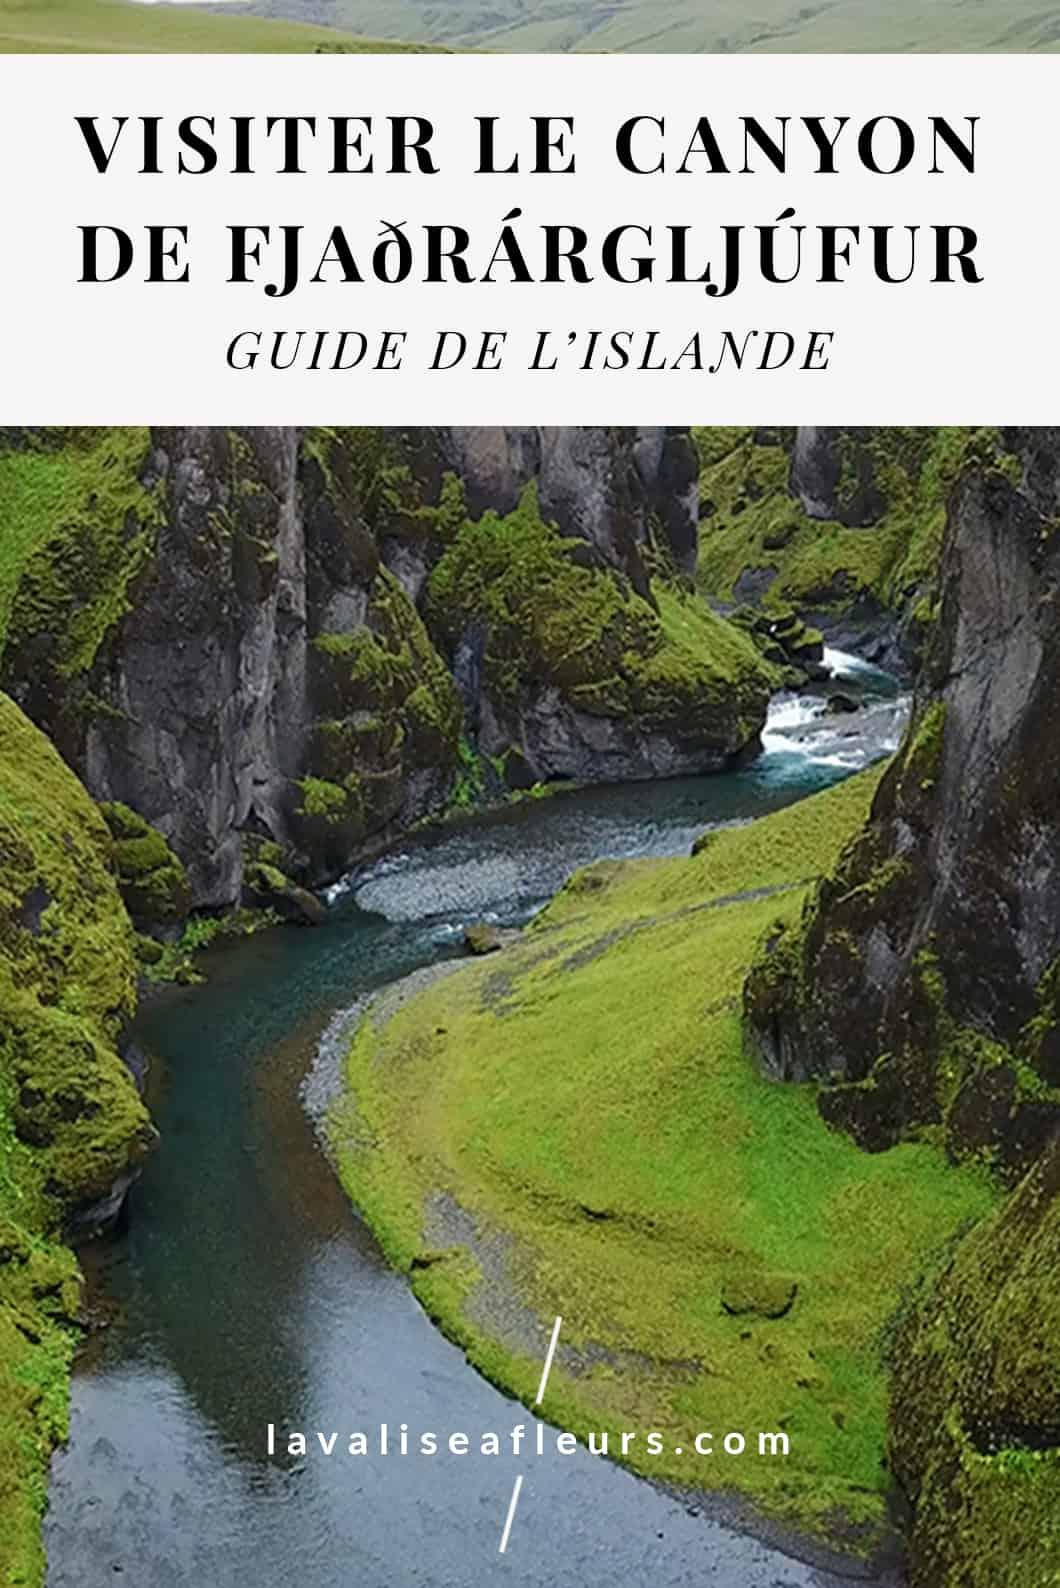 Visiter le Canyon de Fjaðrárgljúfur, voyage en Islande